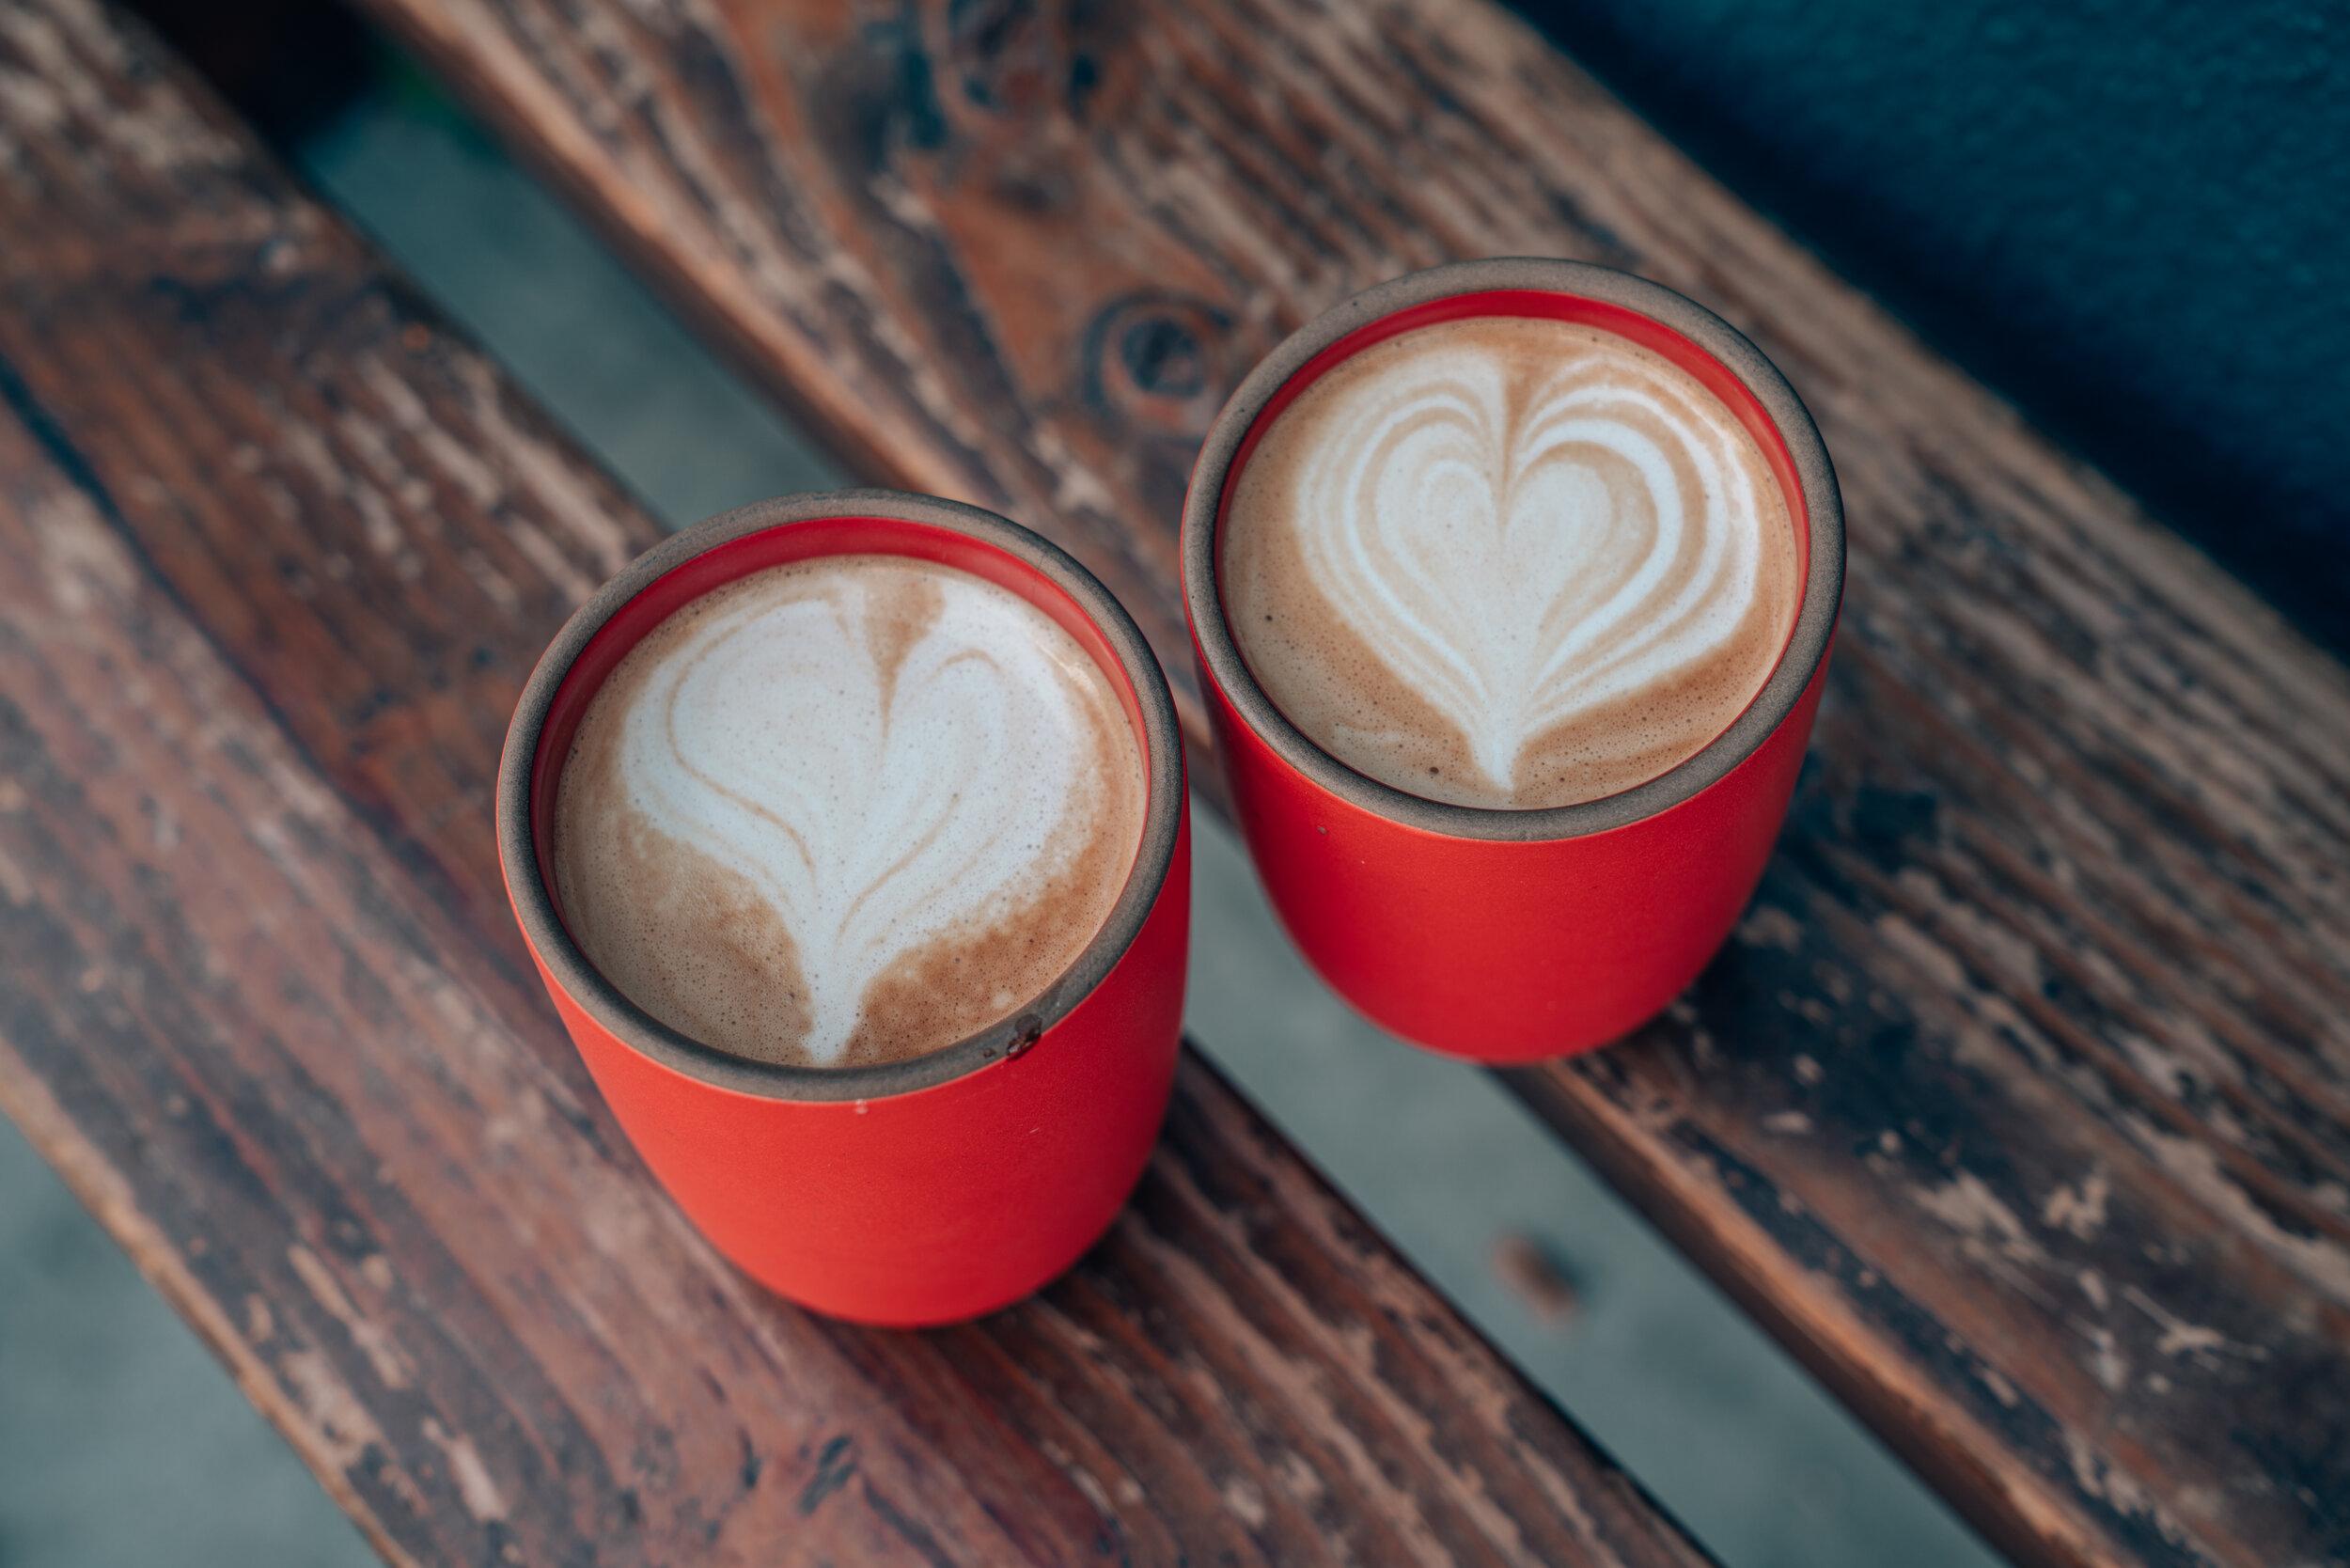 Linea Caffe in San Francisco